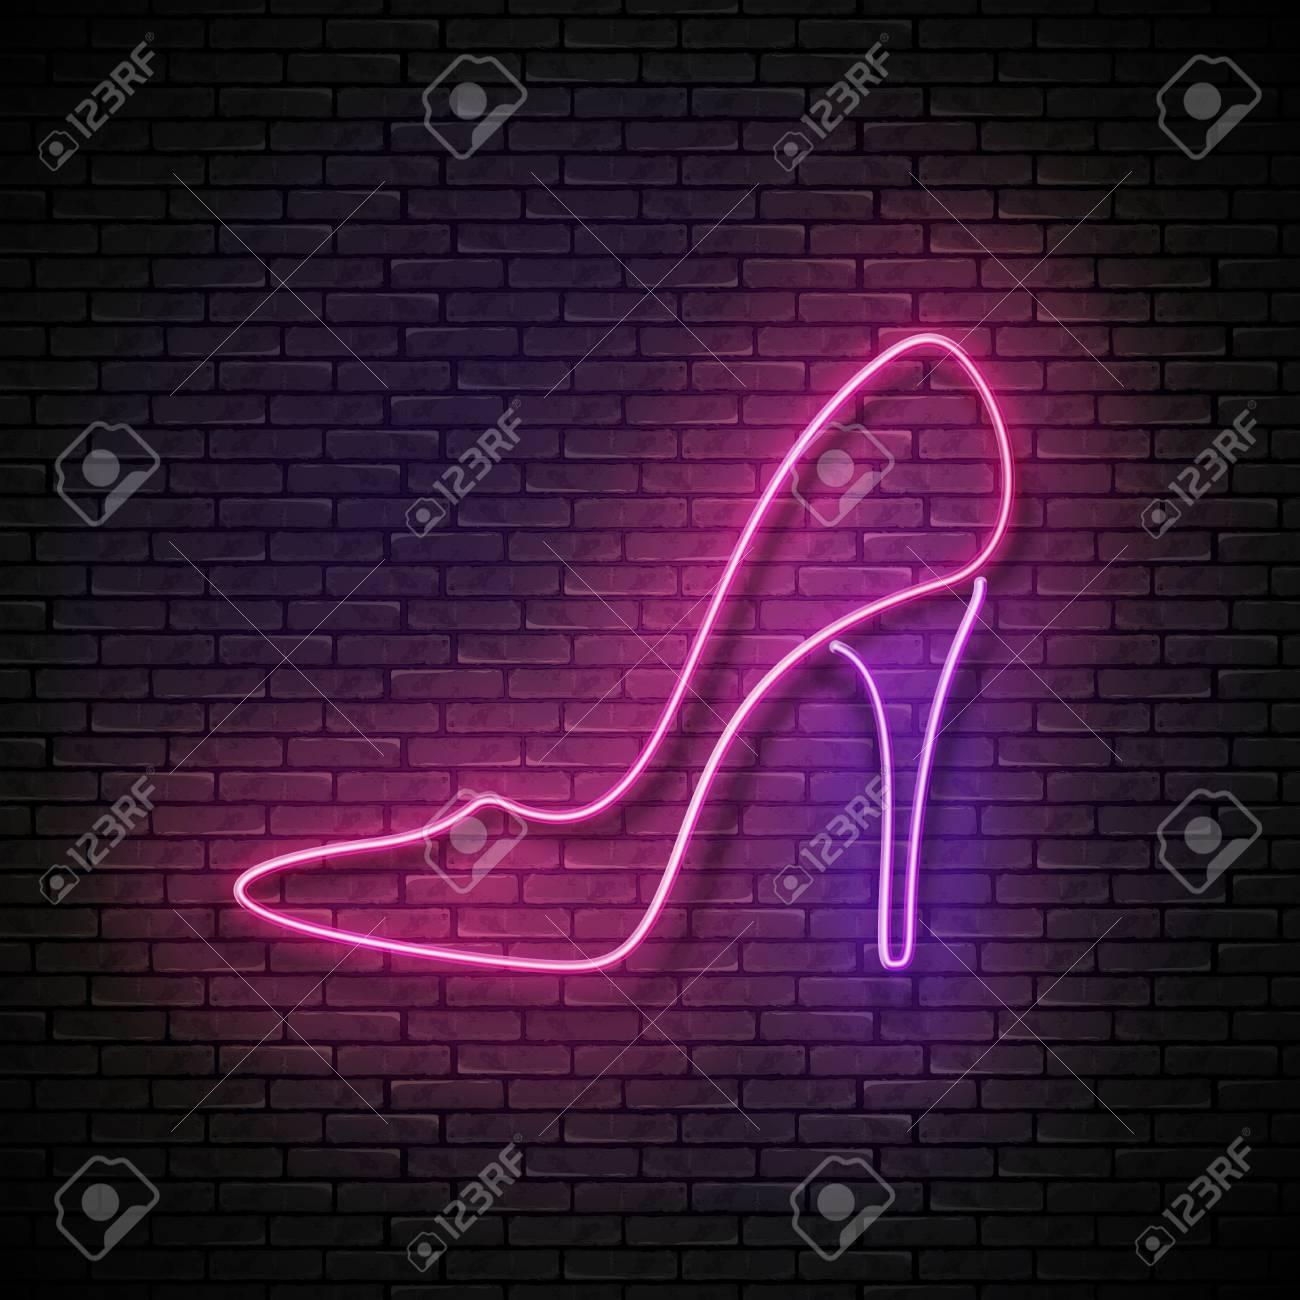 5deef6c9a13 Vintage Glow Signboard with Pink High Heel Shoe